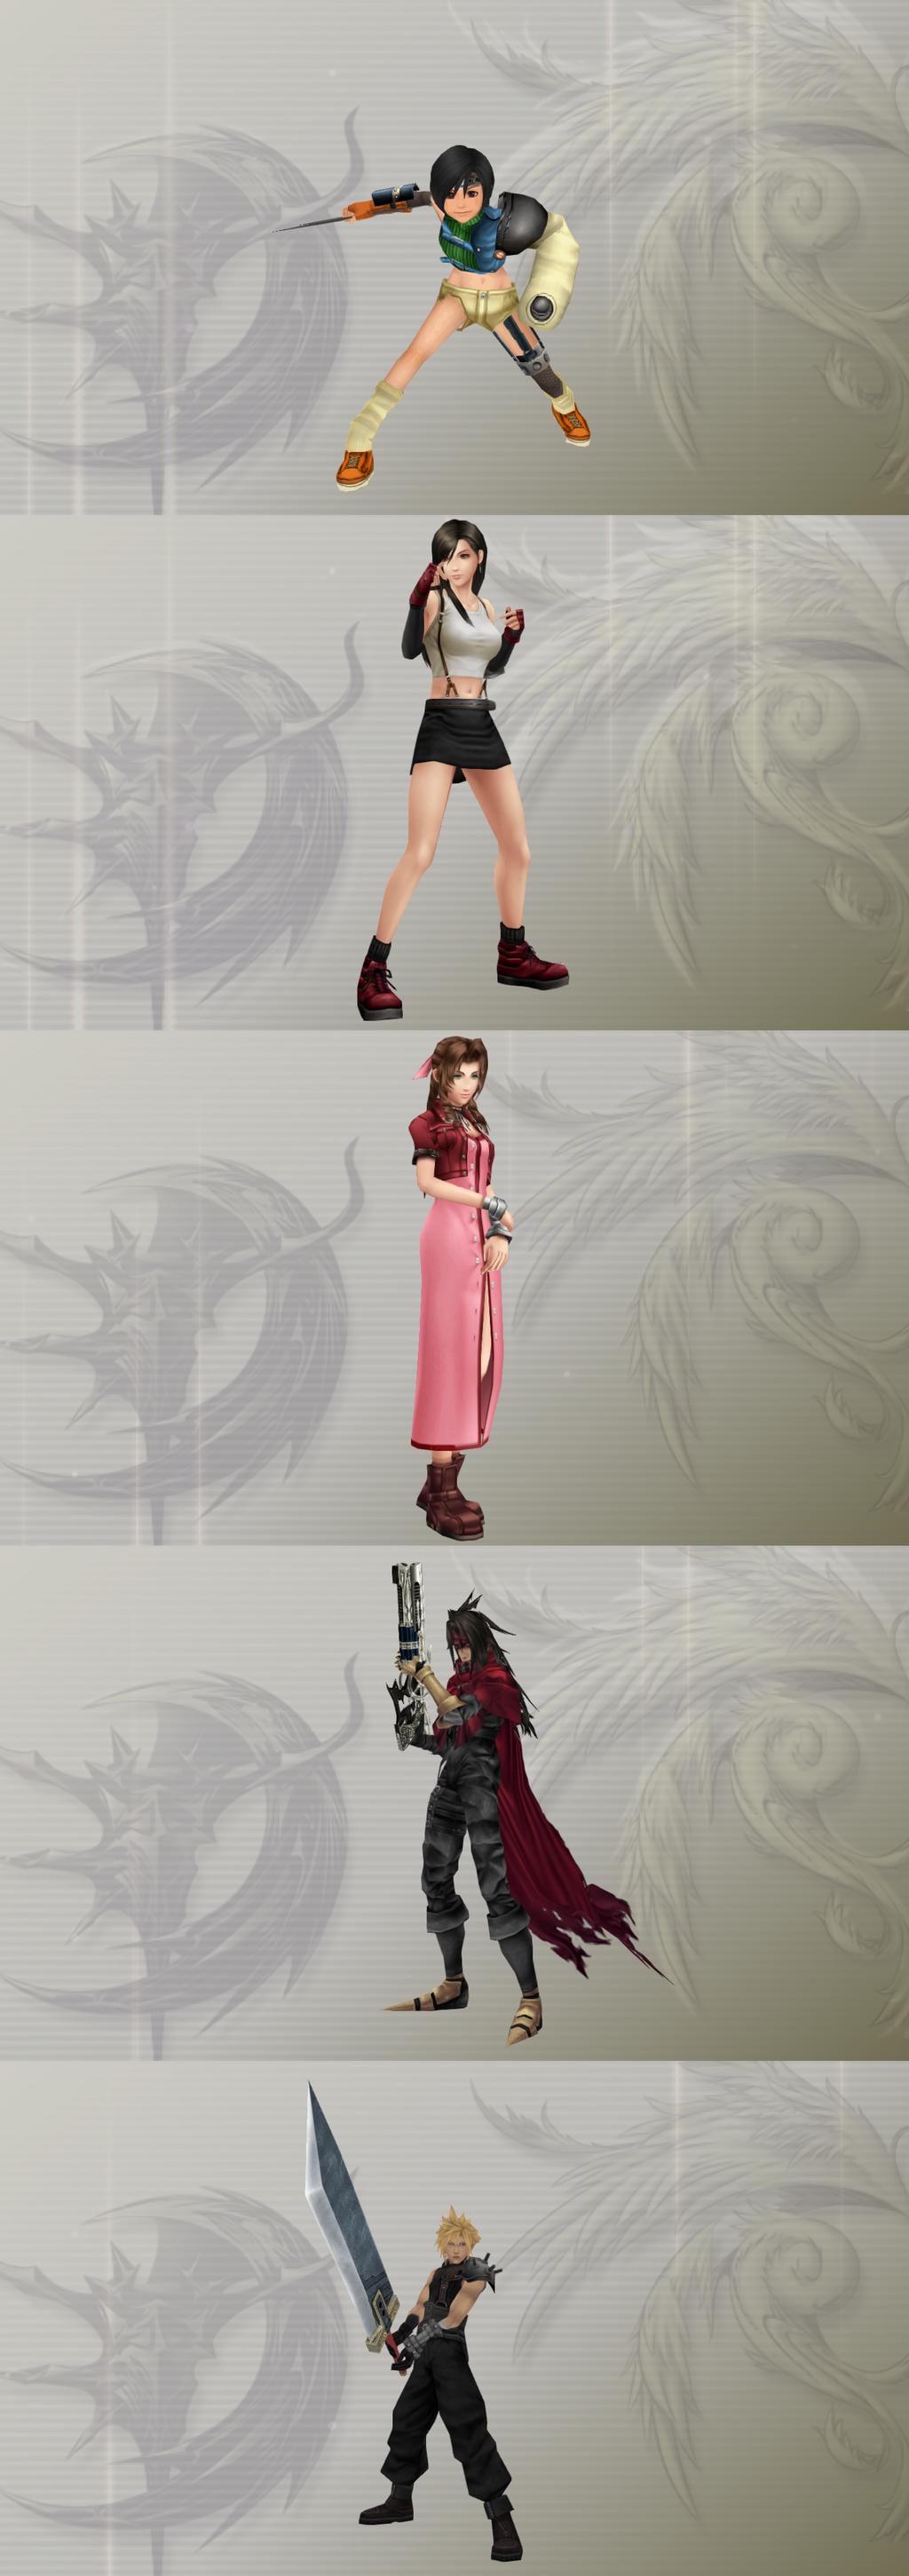 Tifa, Aerith, Yuffie - Final Fantasy VII   Final Fantasy 7 ...   Yuffie And Aerith